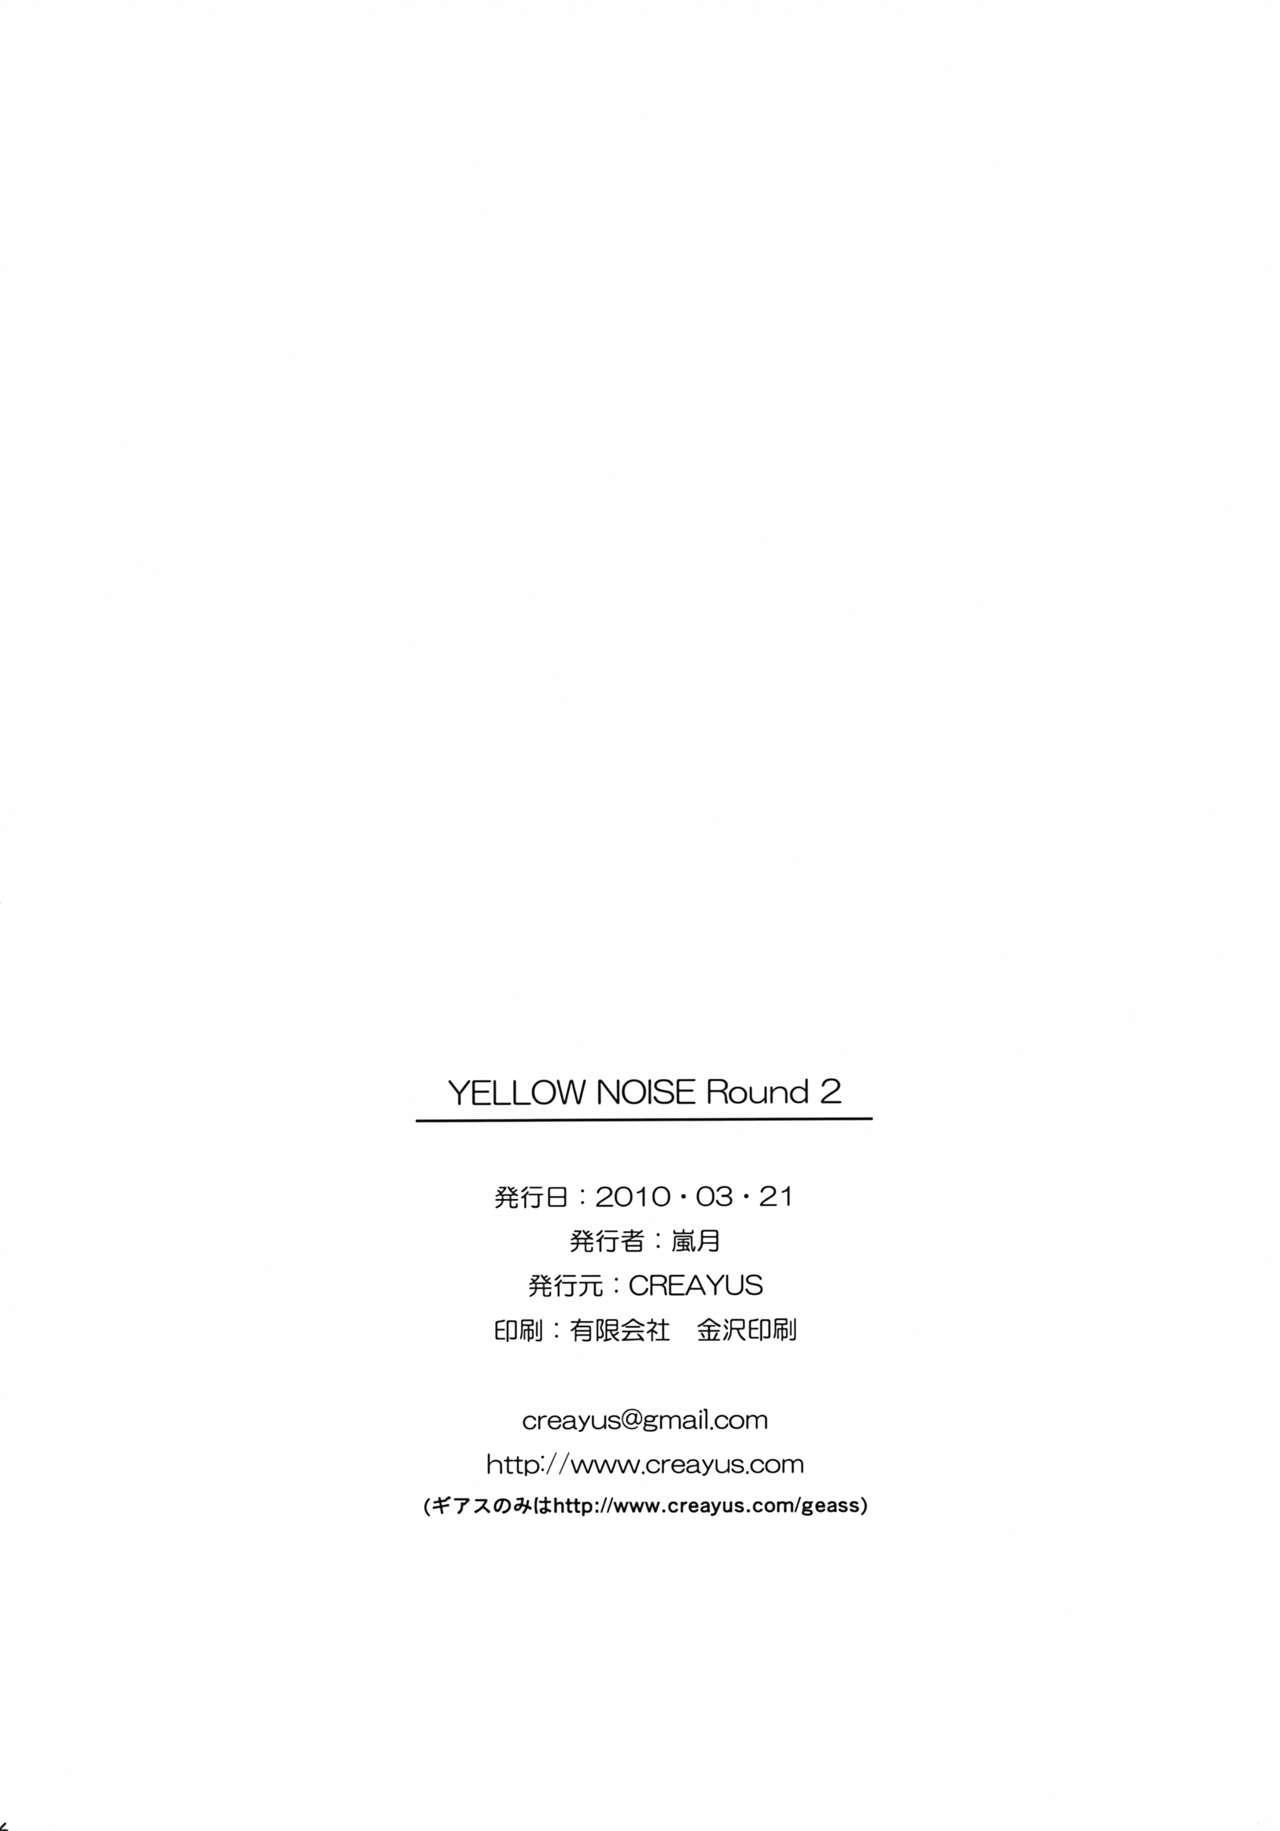 Yellow Noise Round 2 24